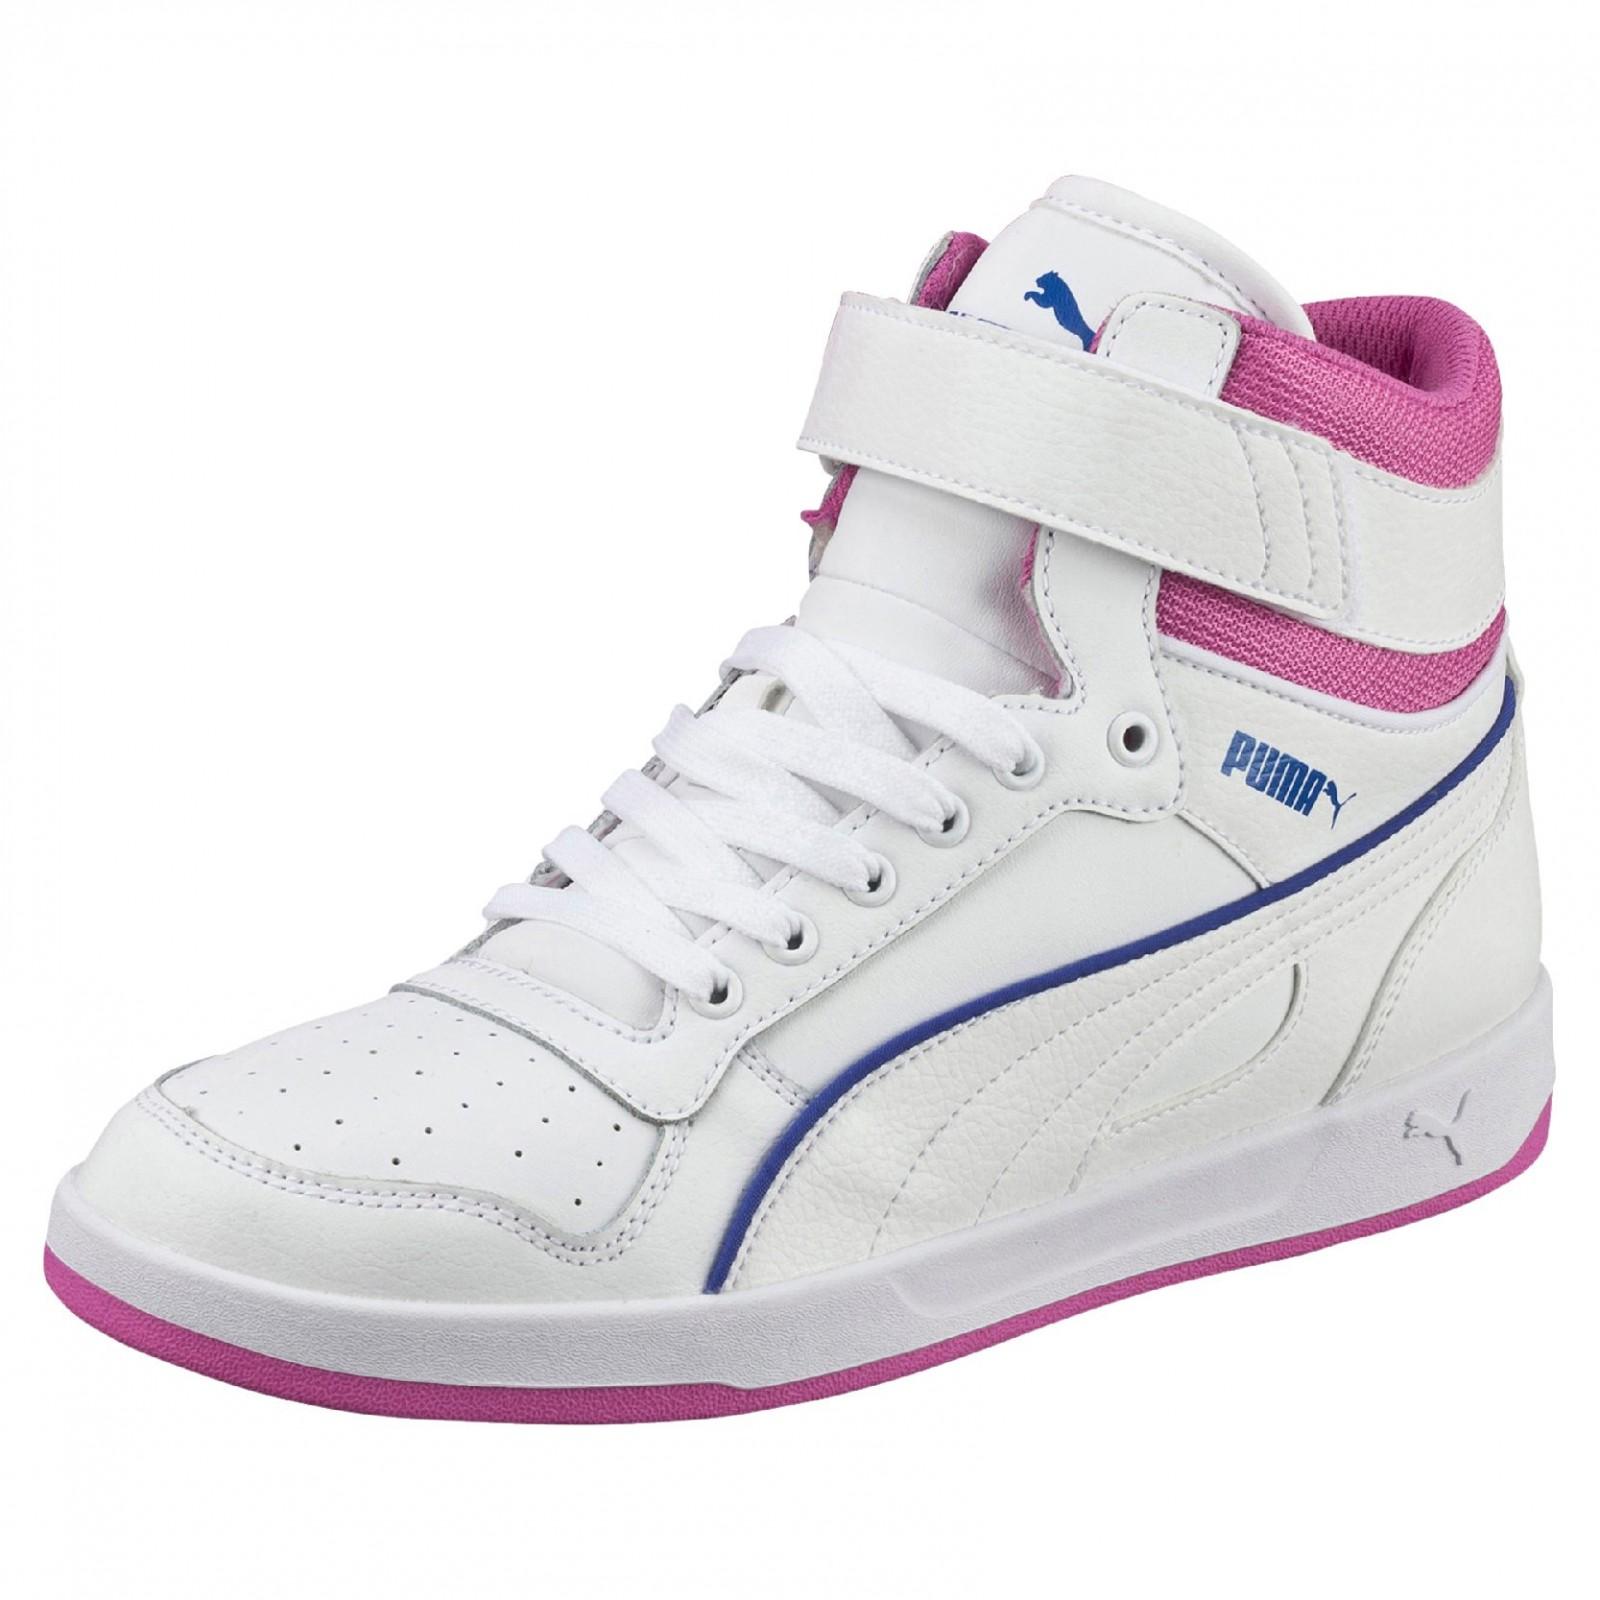 Dámské boty Puma Liza Mid white-white 68bc6cce95